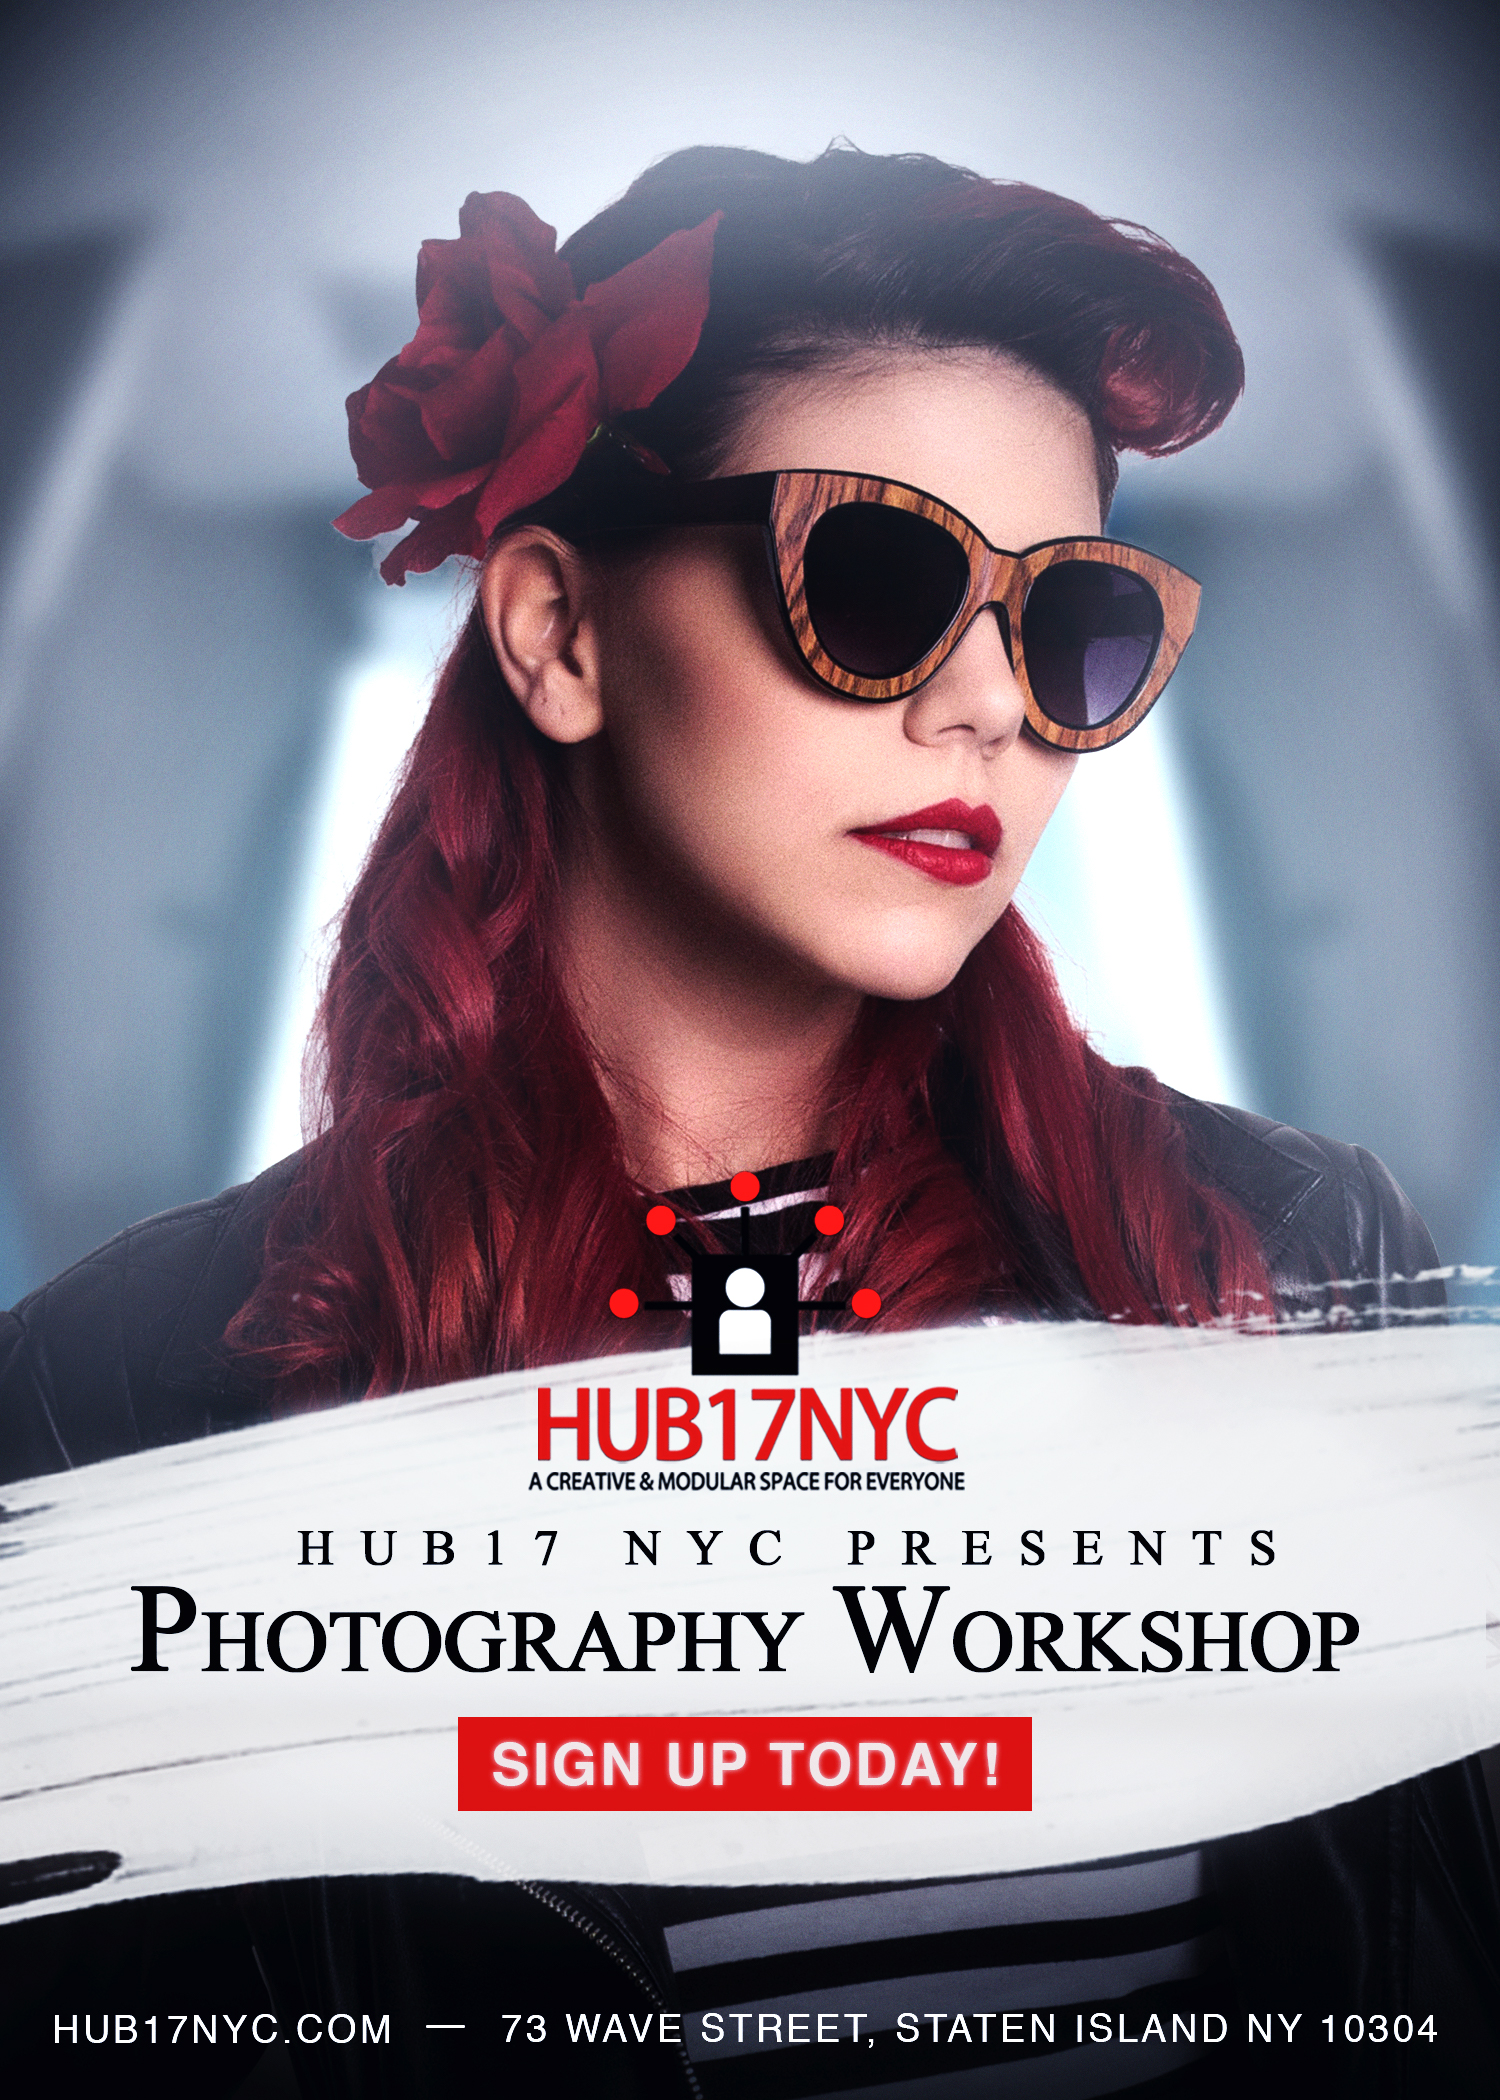 HUB17 NYC_PHOTOGRAPHY WORKSHOP FLYER_V2R1_5x7.jpg